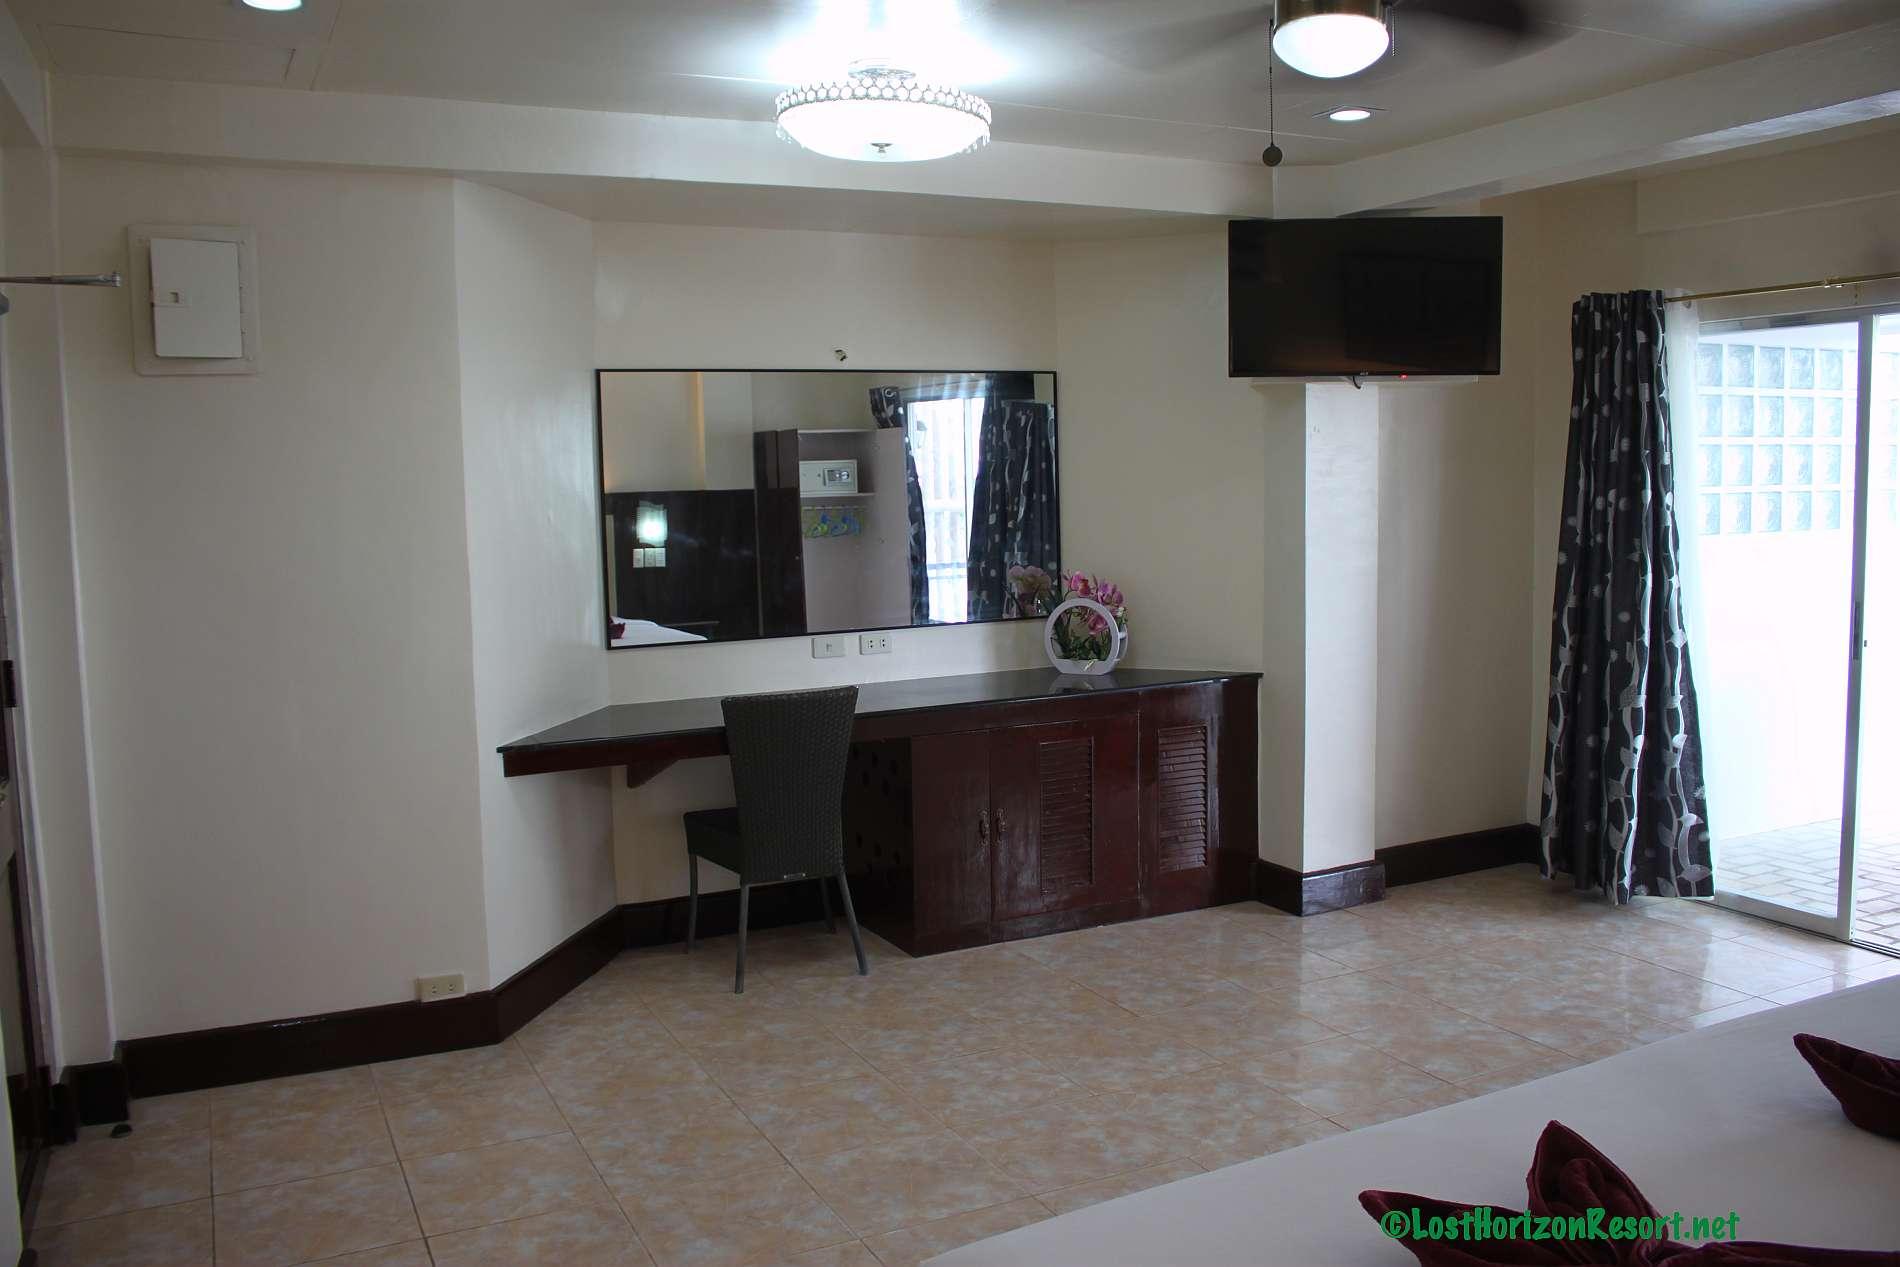 Lost-Horizon-Beach-Resort-Alona-Beach-Panglao-Bohol-Philippines-sun-view-room026